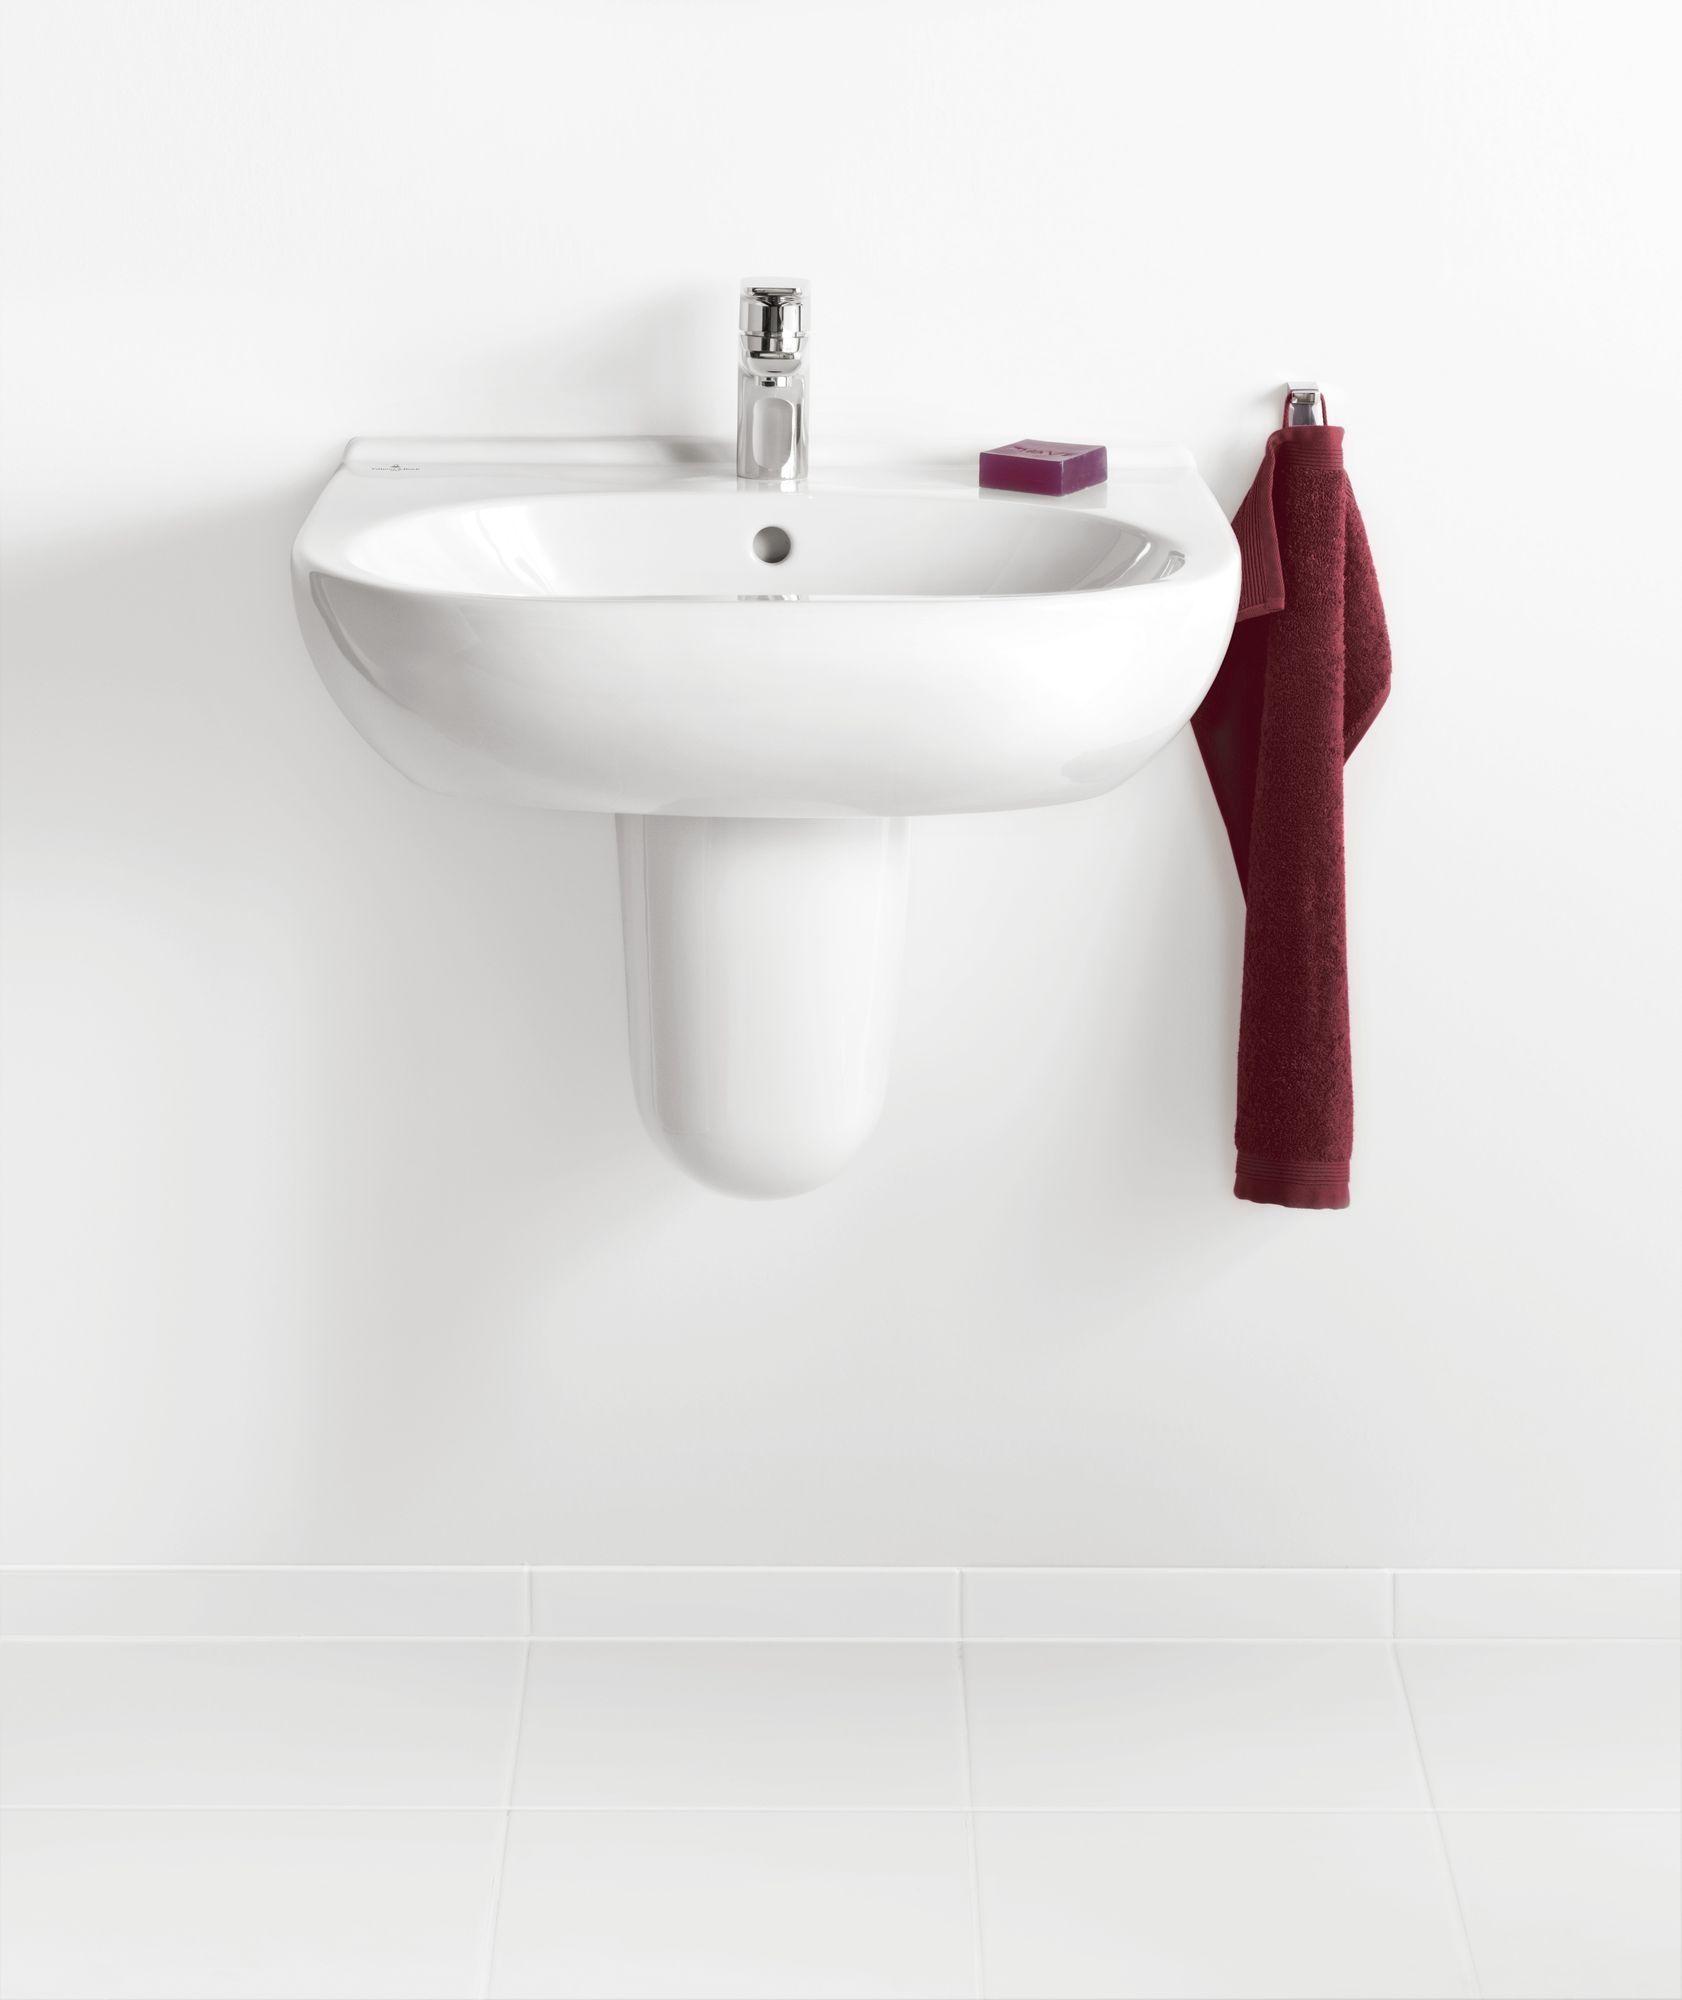 Villeroy & Boch O.novo Ablaufhaube weiß mit ceramicplus 526600R1